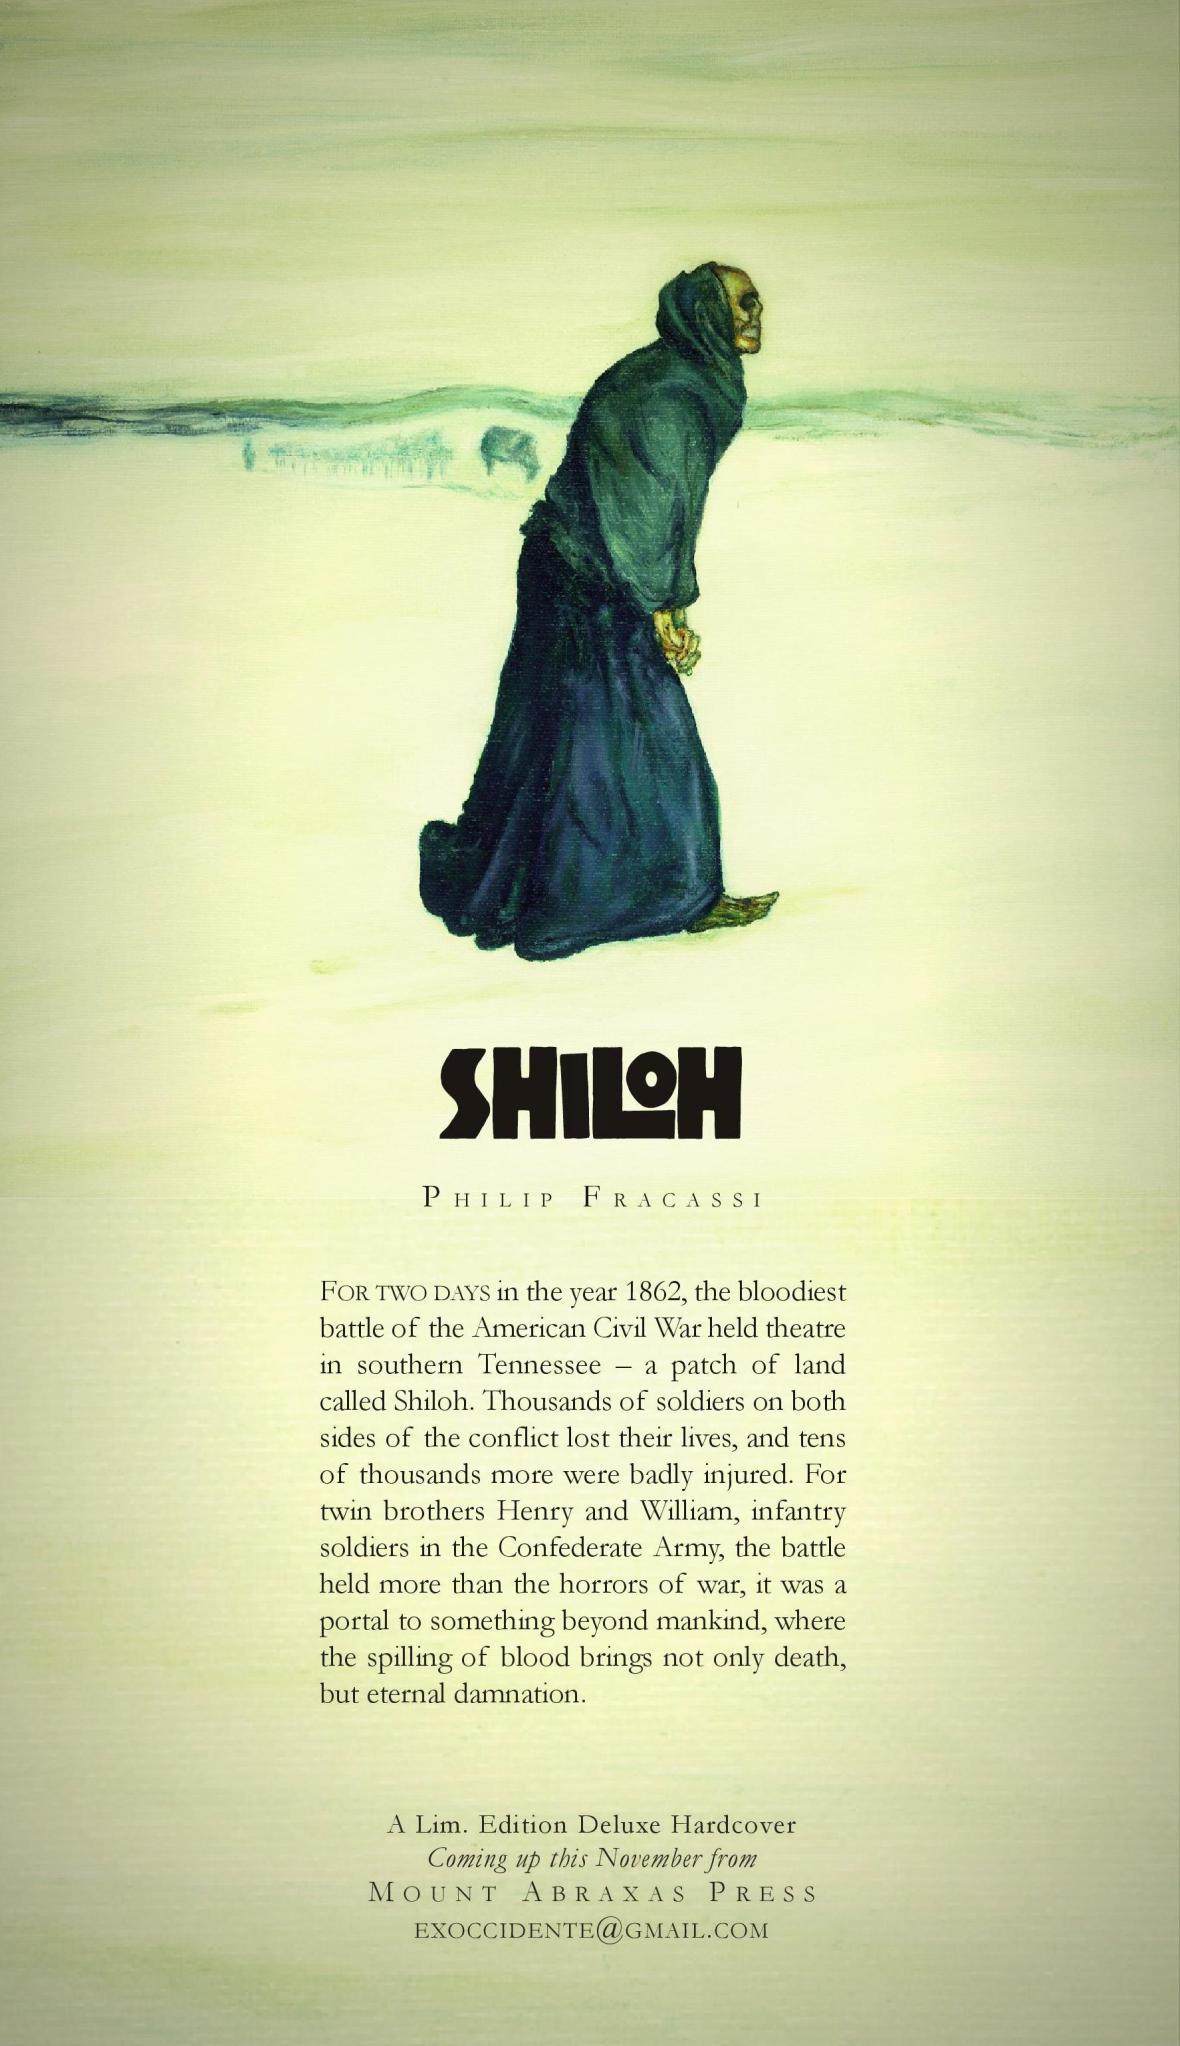 shiloh-adv.jpg